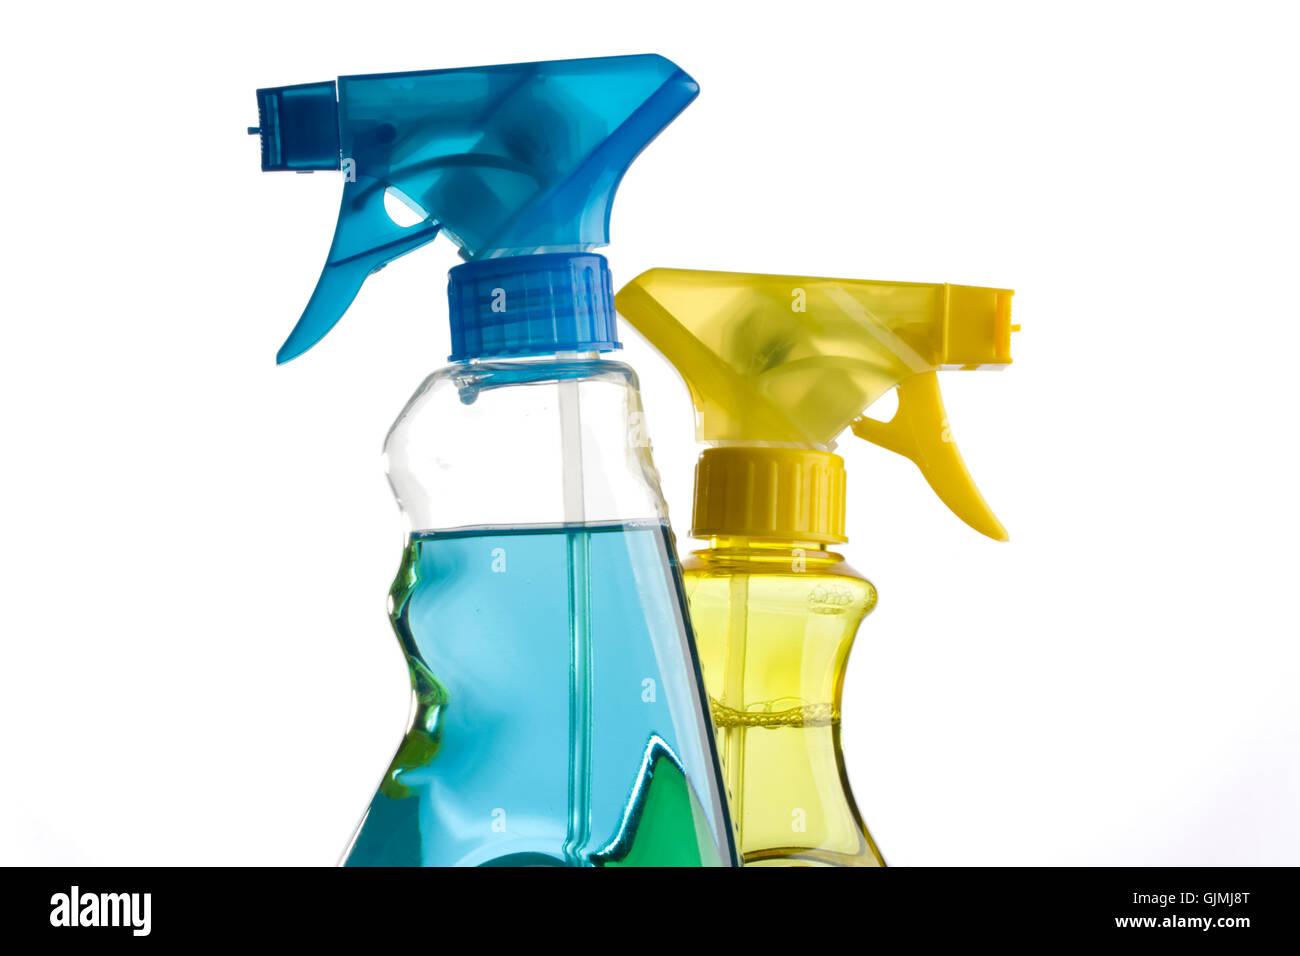 household bottle squirt - Stock Image